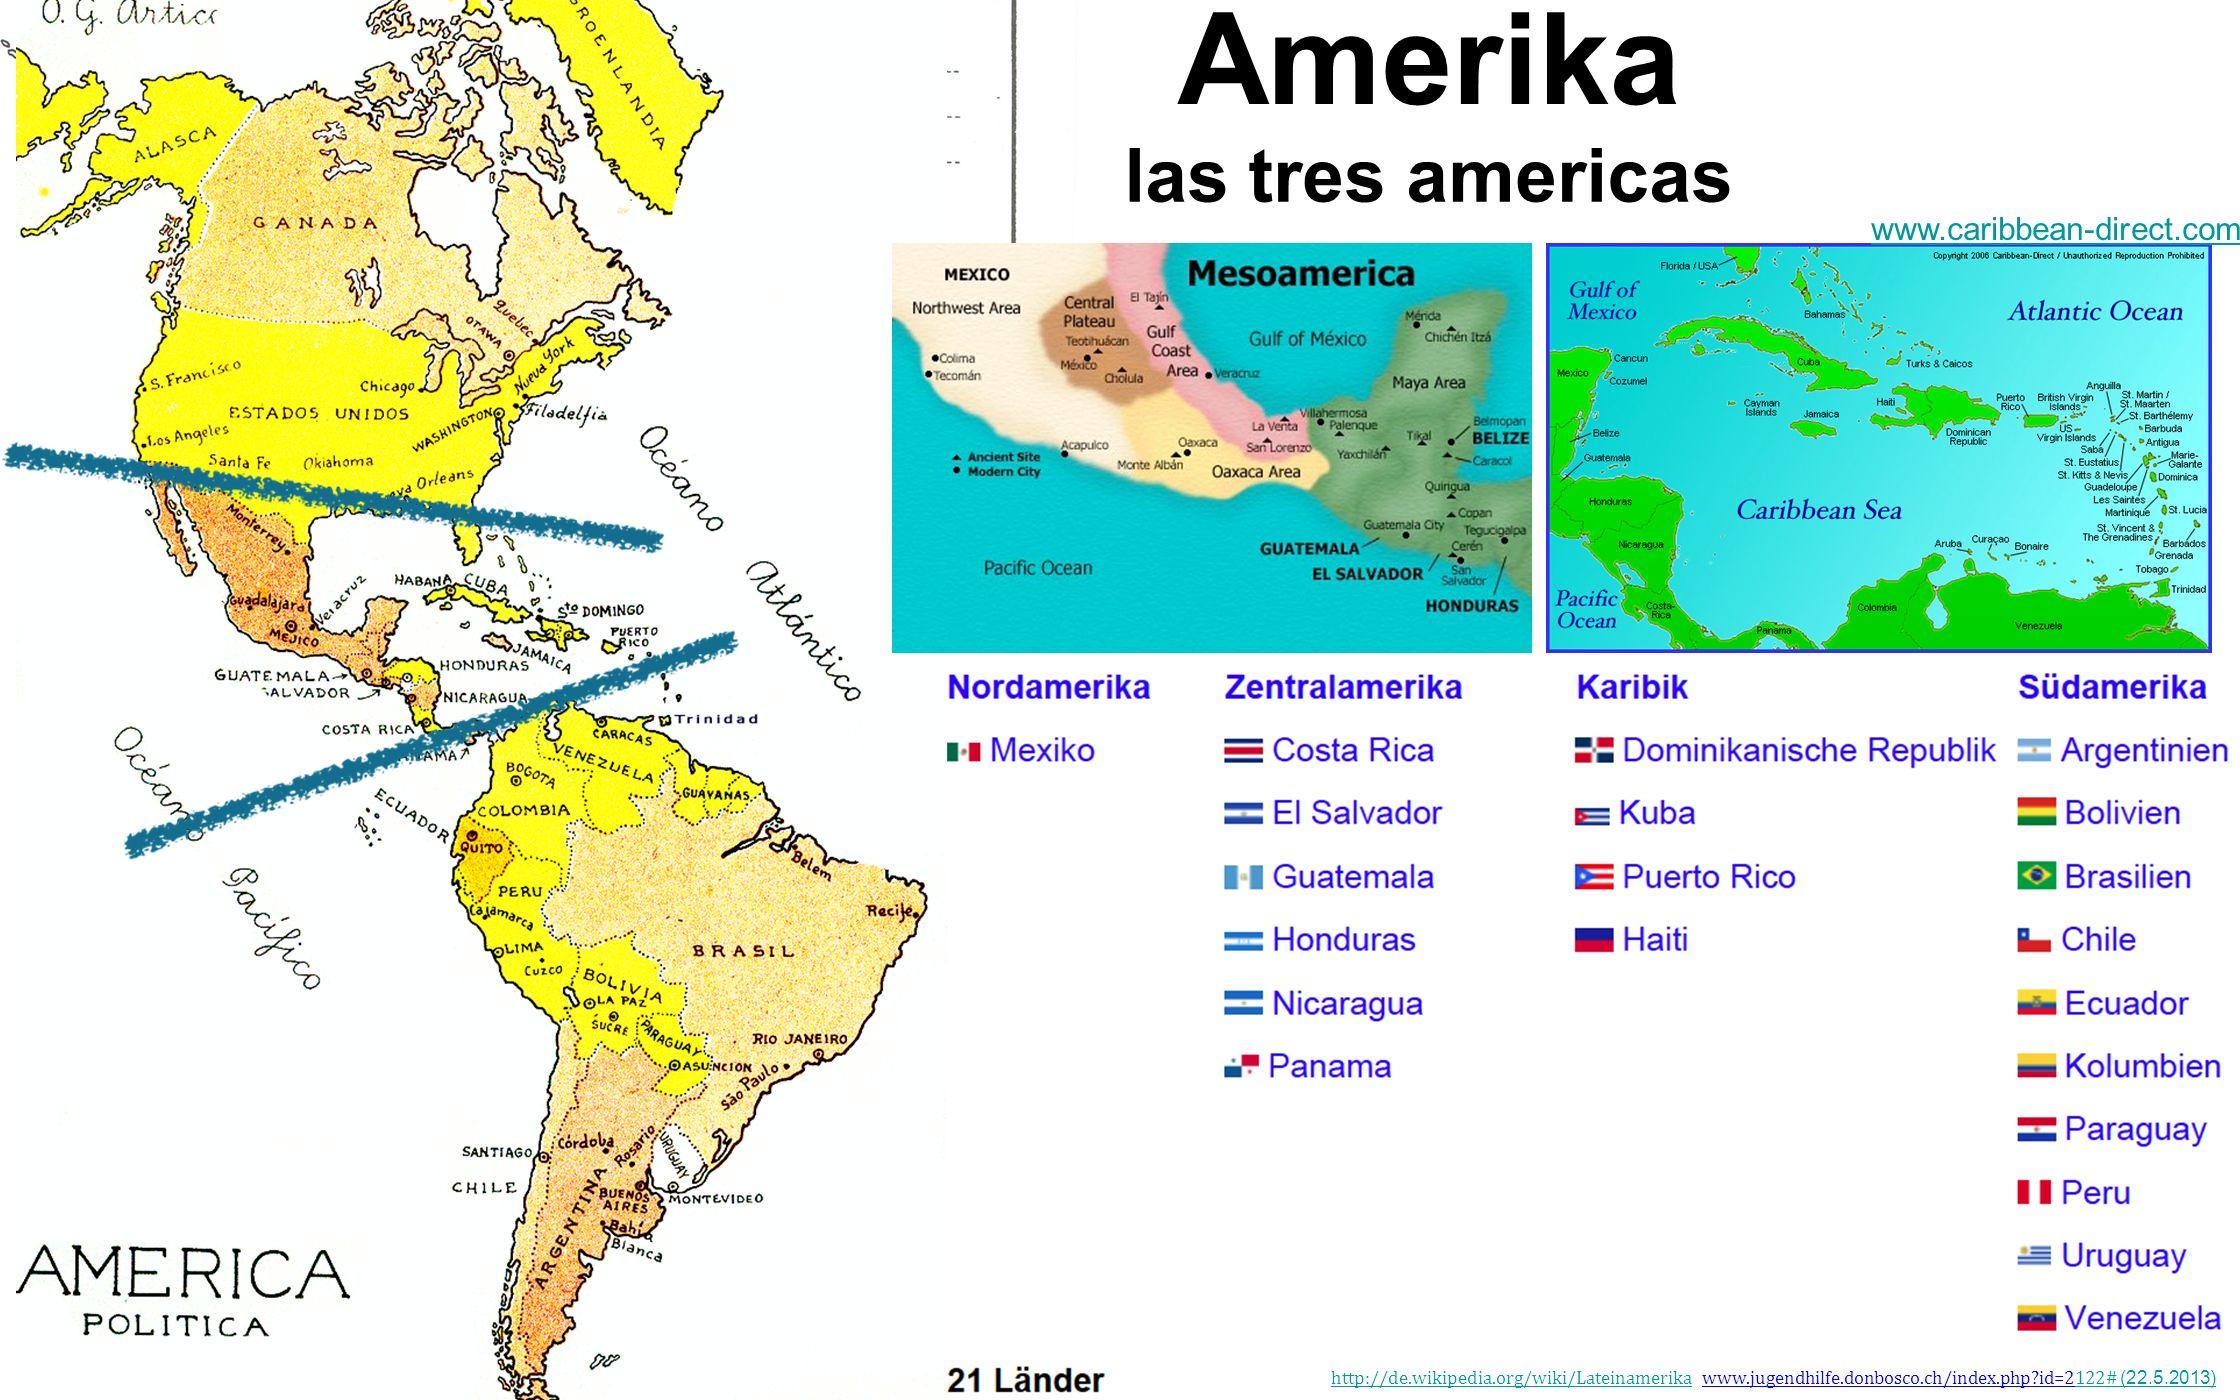 las tres americas Amerika www.caribbean-direct.comwww.caribbean-direct.com/ http://de.wikipedia.org/wiki/Lateinamerikahttp://de.wikipedia.org/wiki/Lat